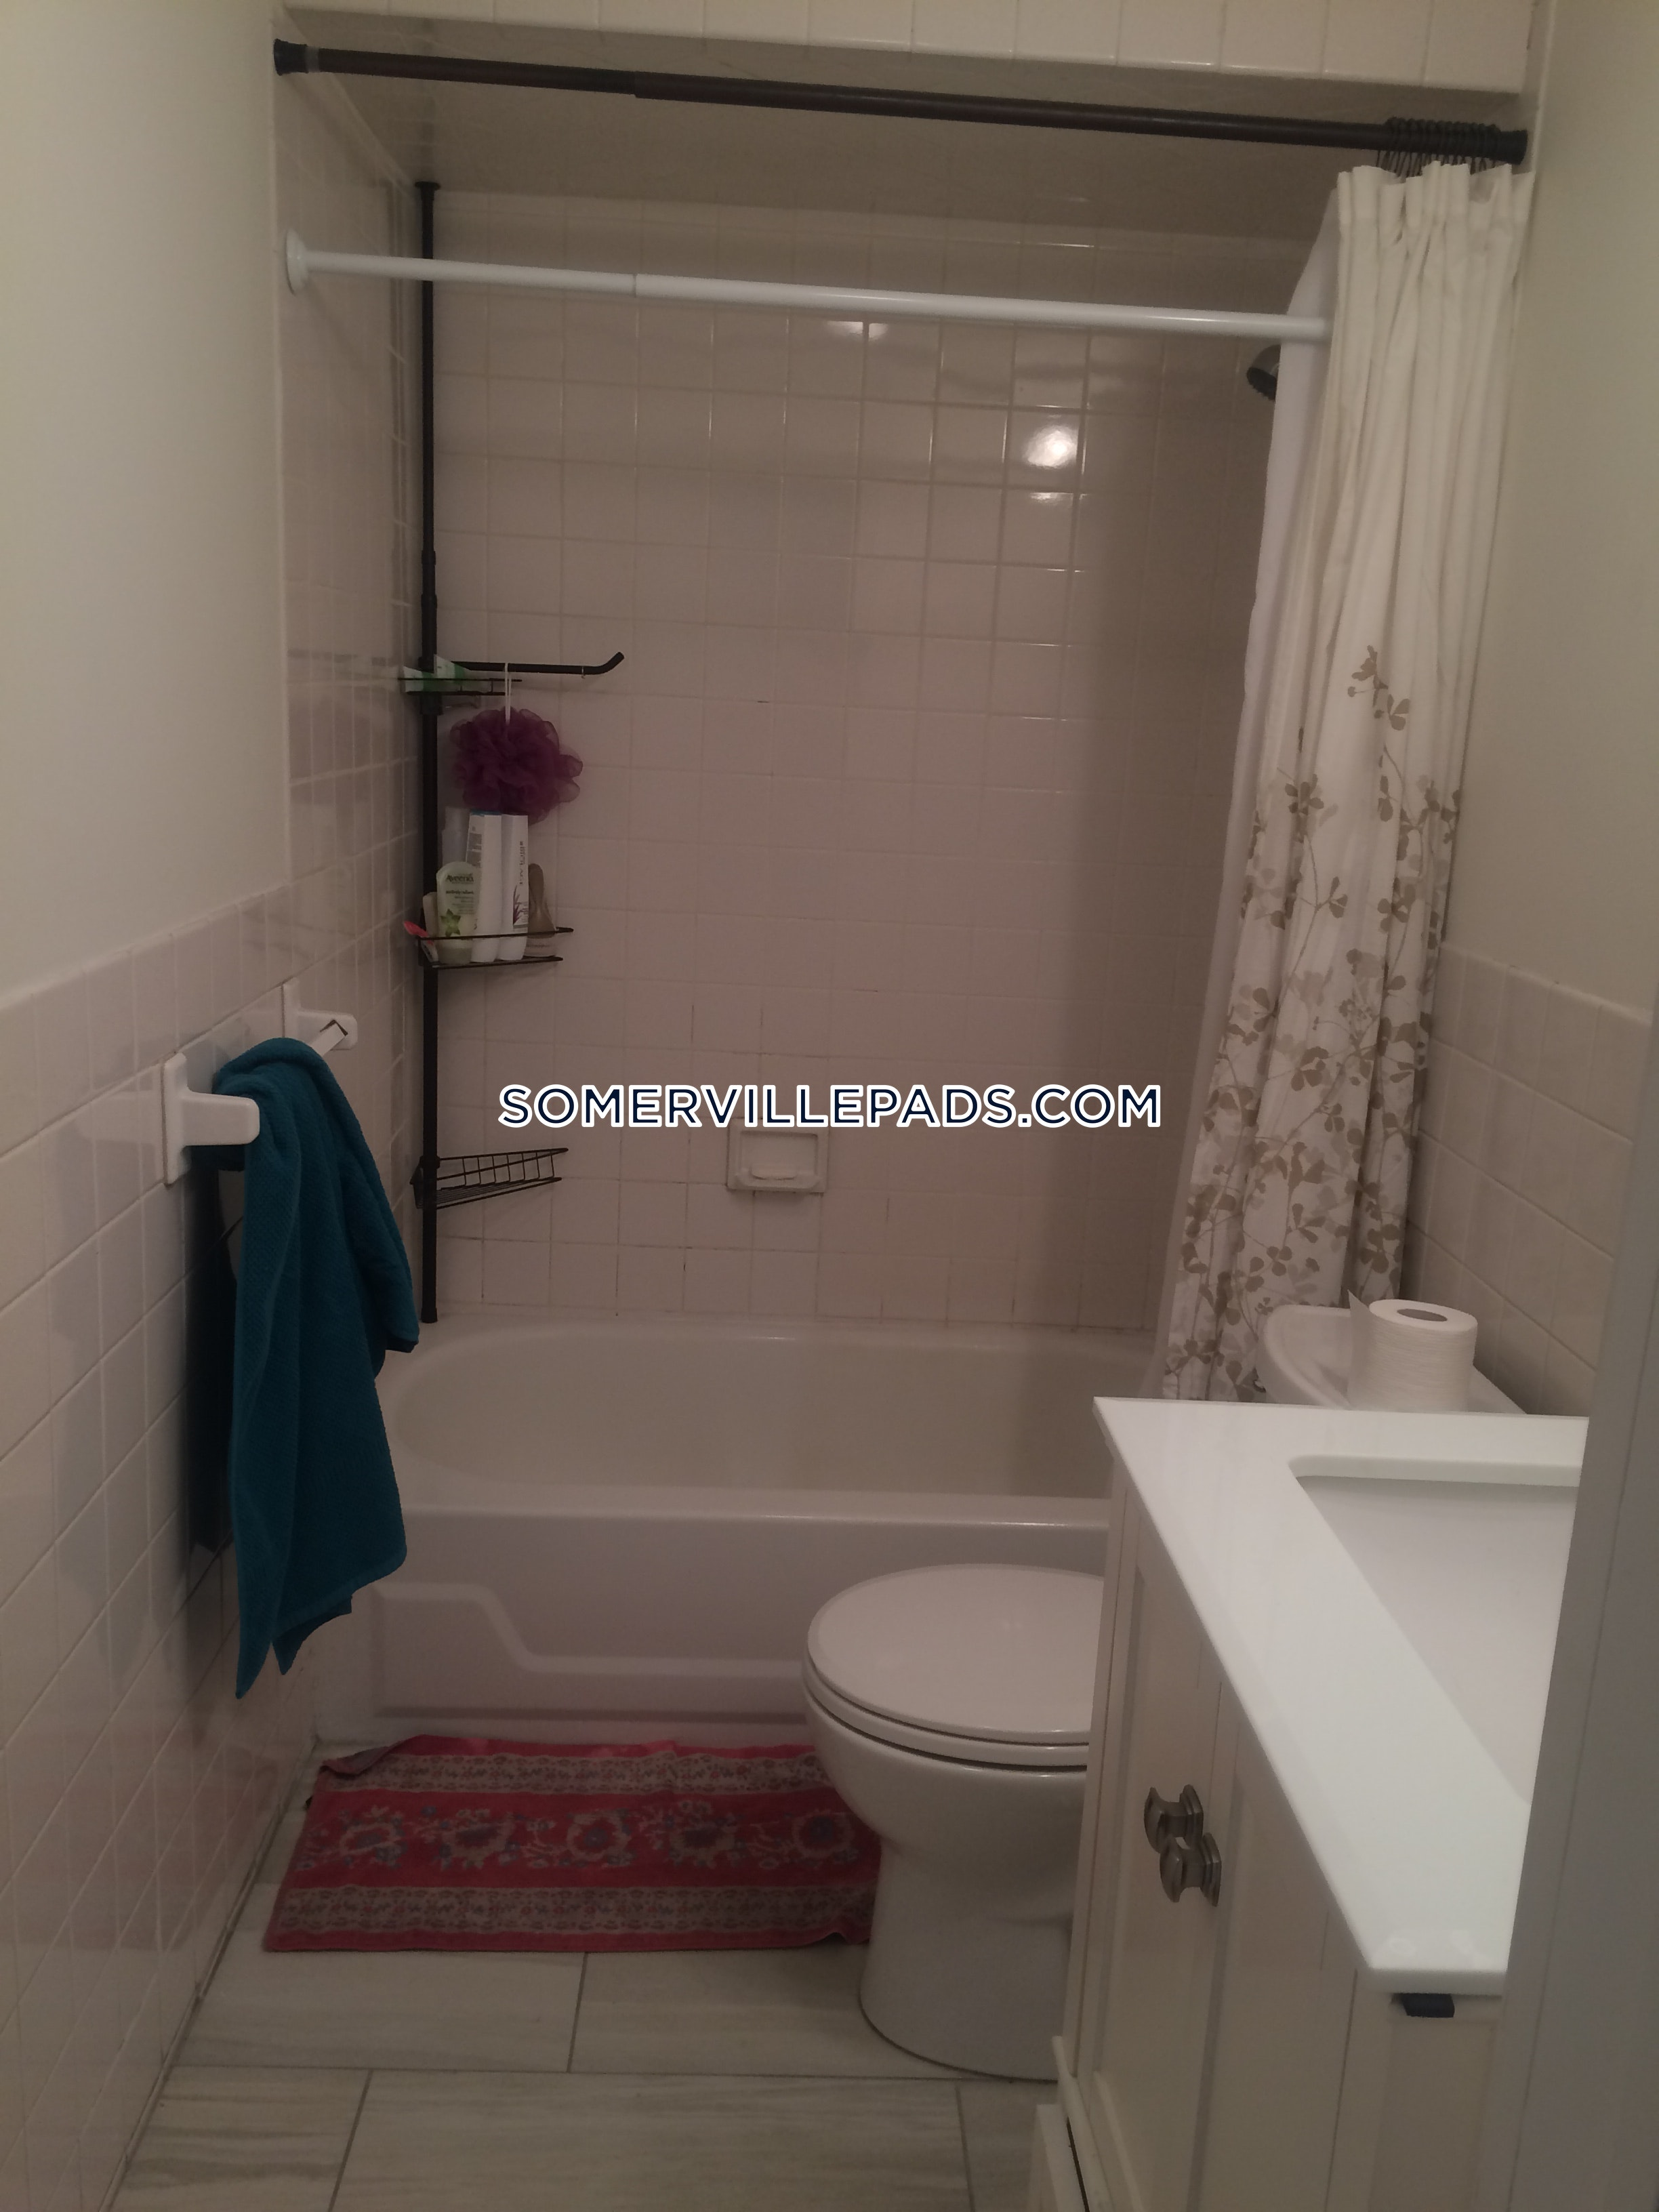 3-beds-2-baths-somerville-east-somerville-3300-449628